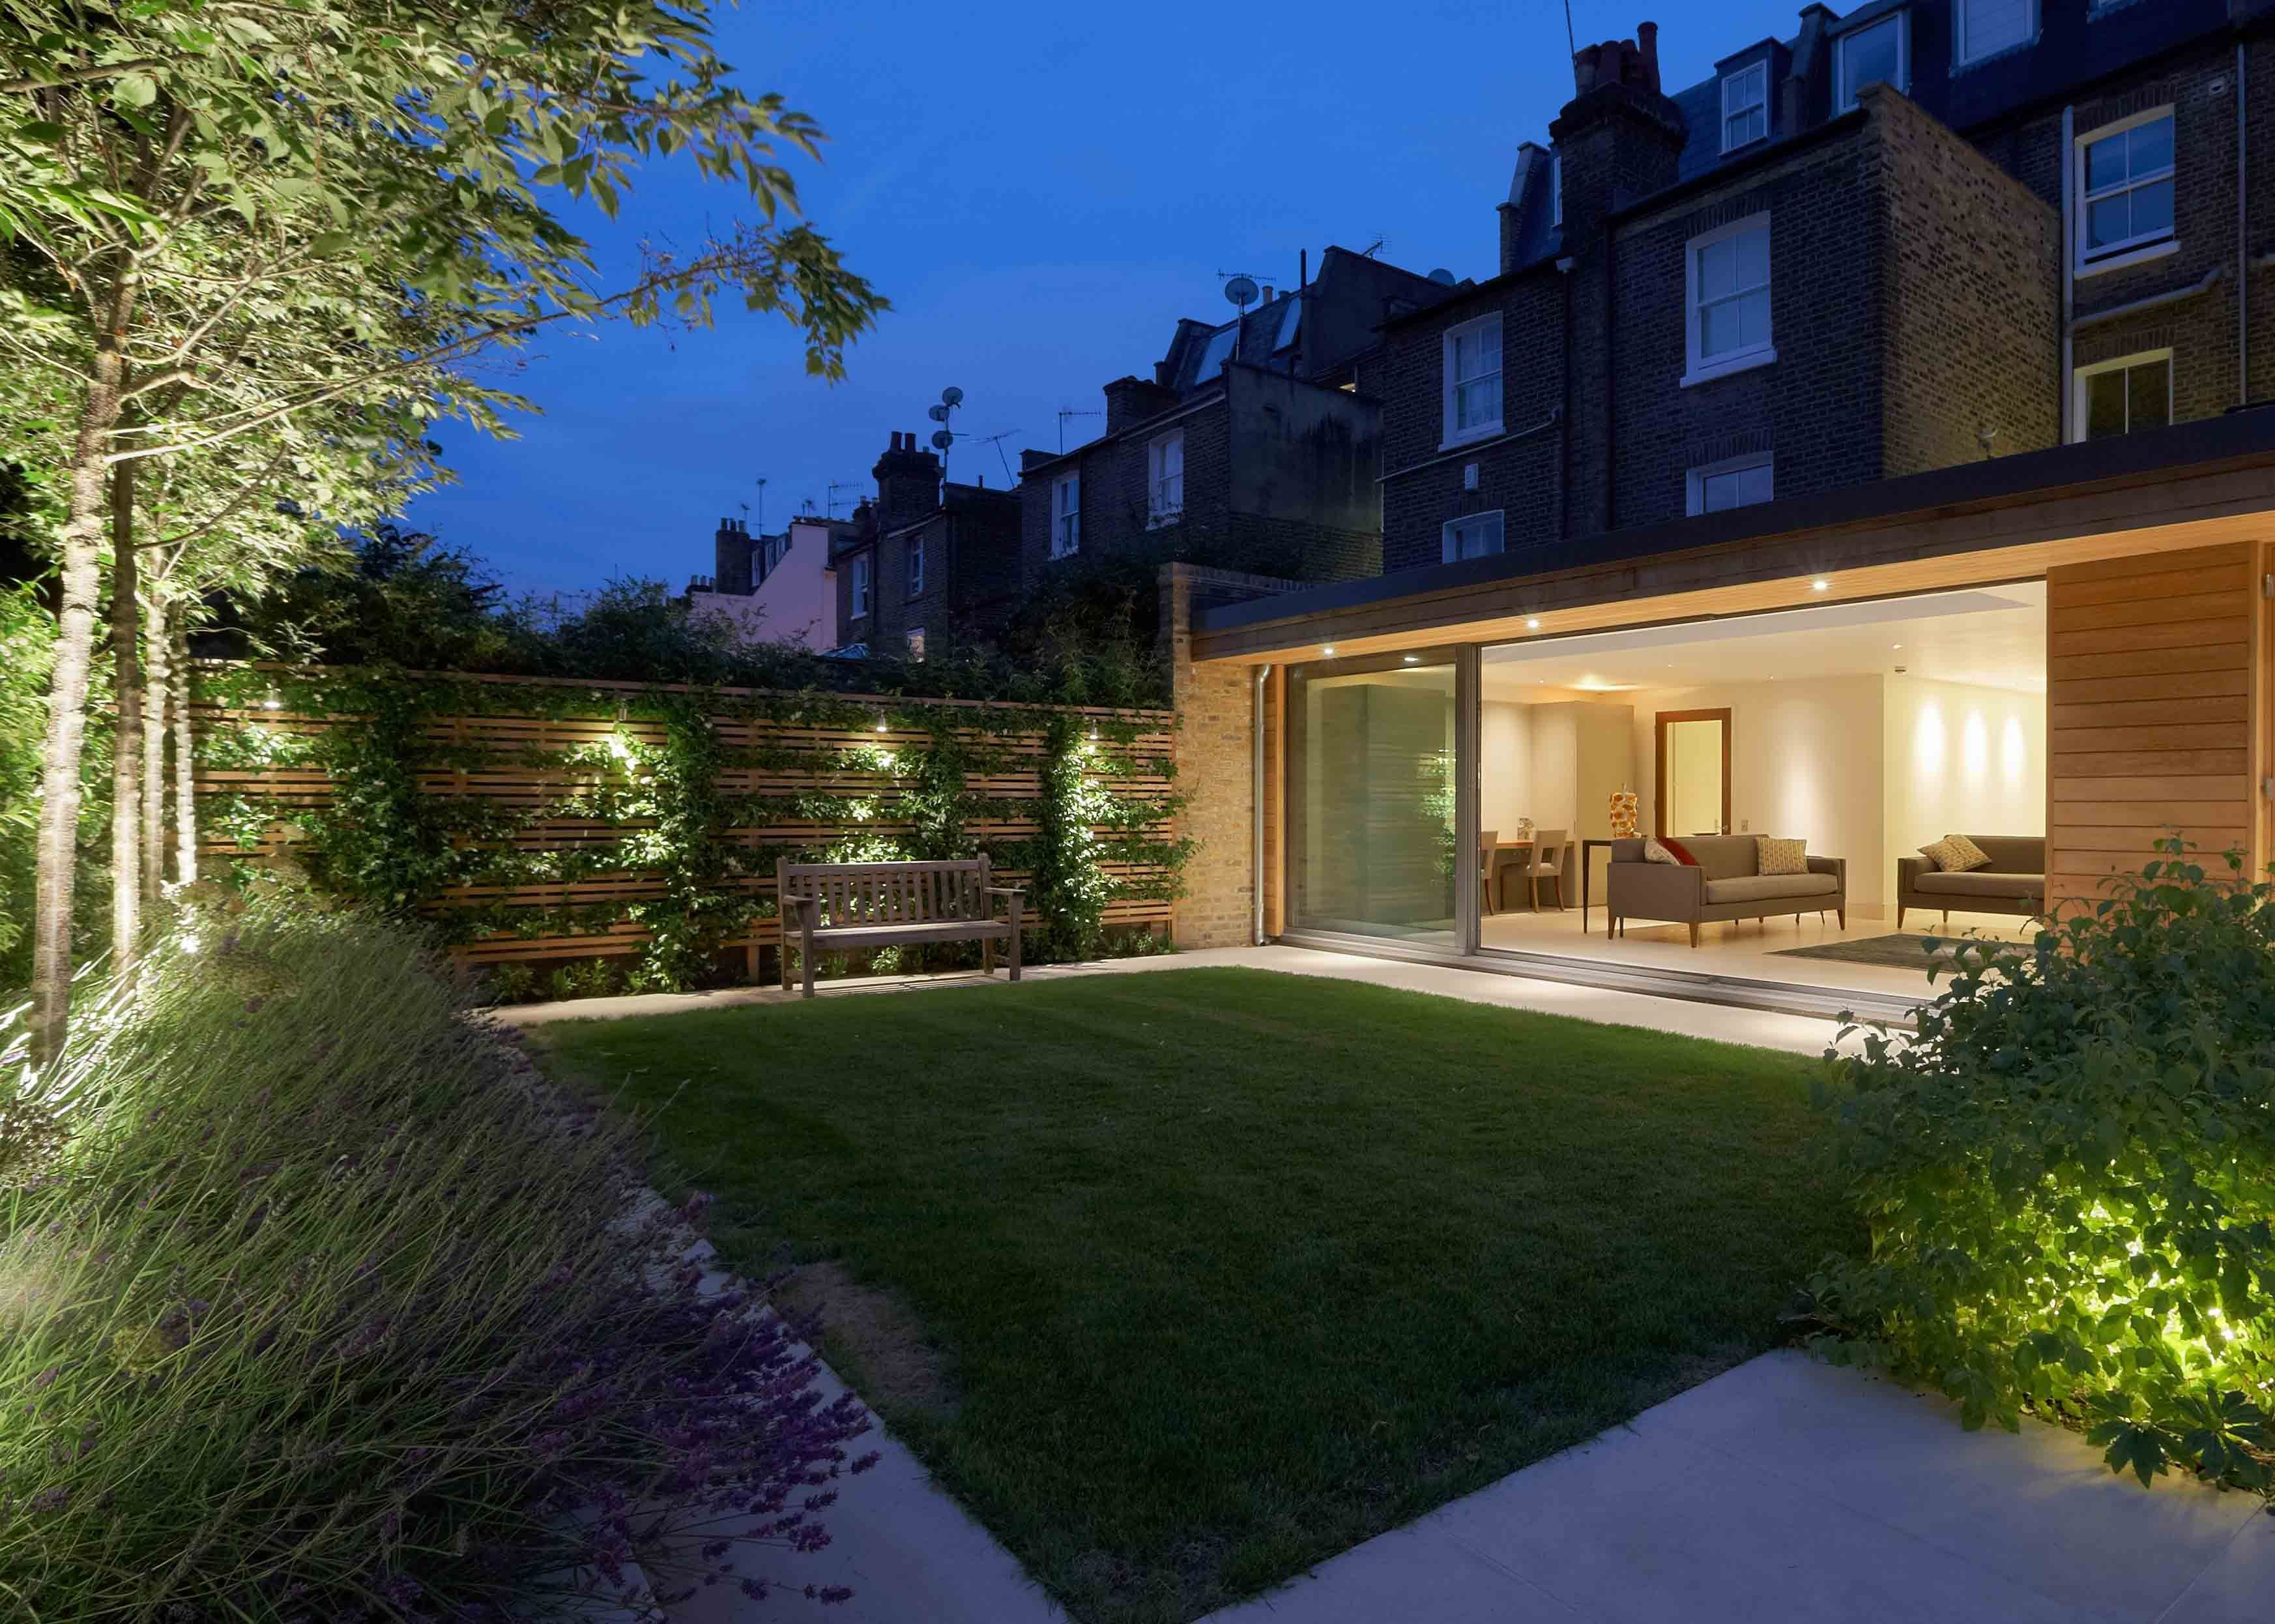 Outdoor Lighting Ideas For Patio Be Honest Selecting The Right Outdoor Lighting Ideas For F Landscape Lighting Design Garden Lighting Design Garden Lighting